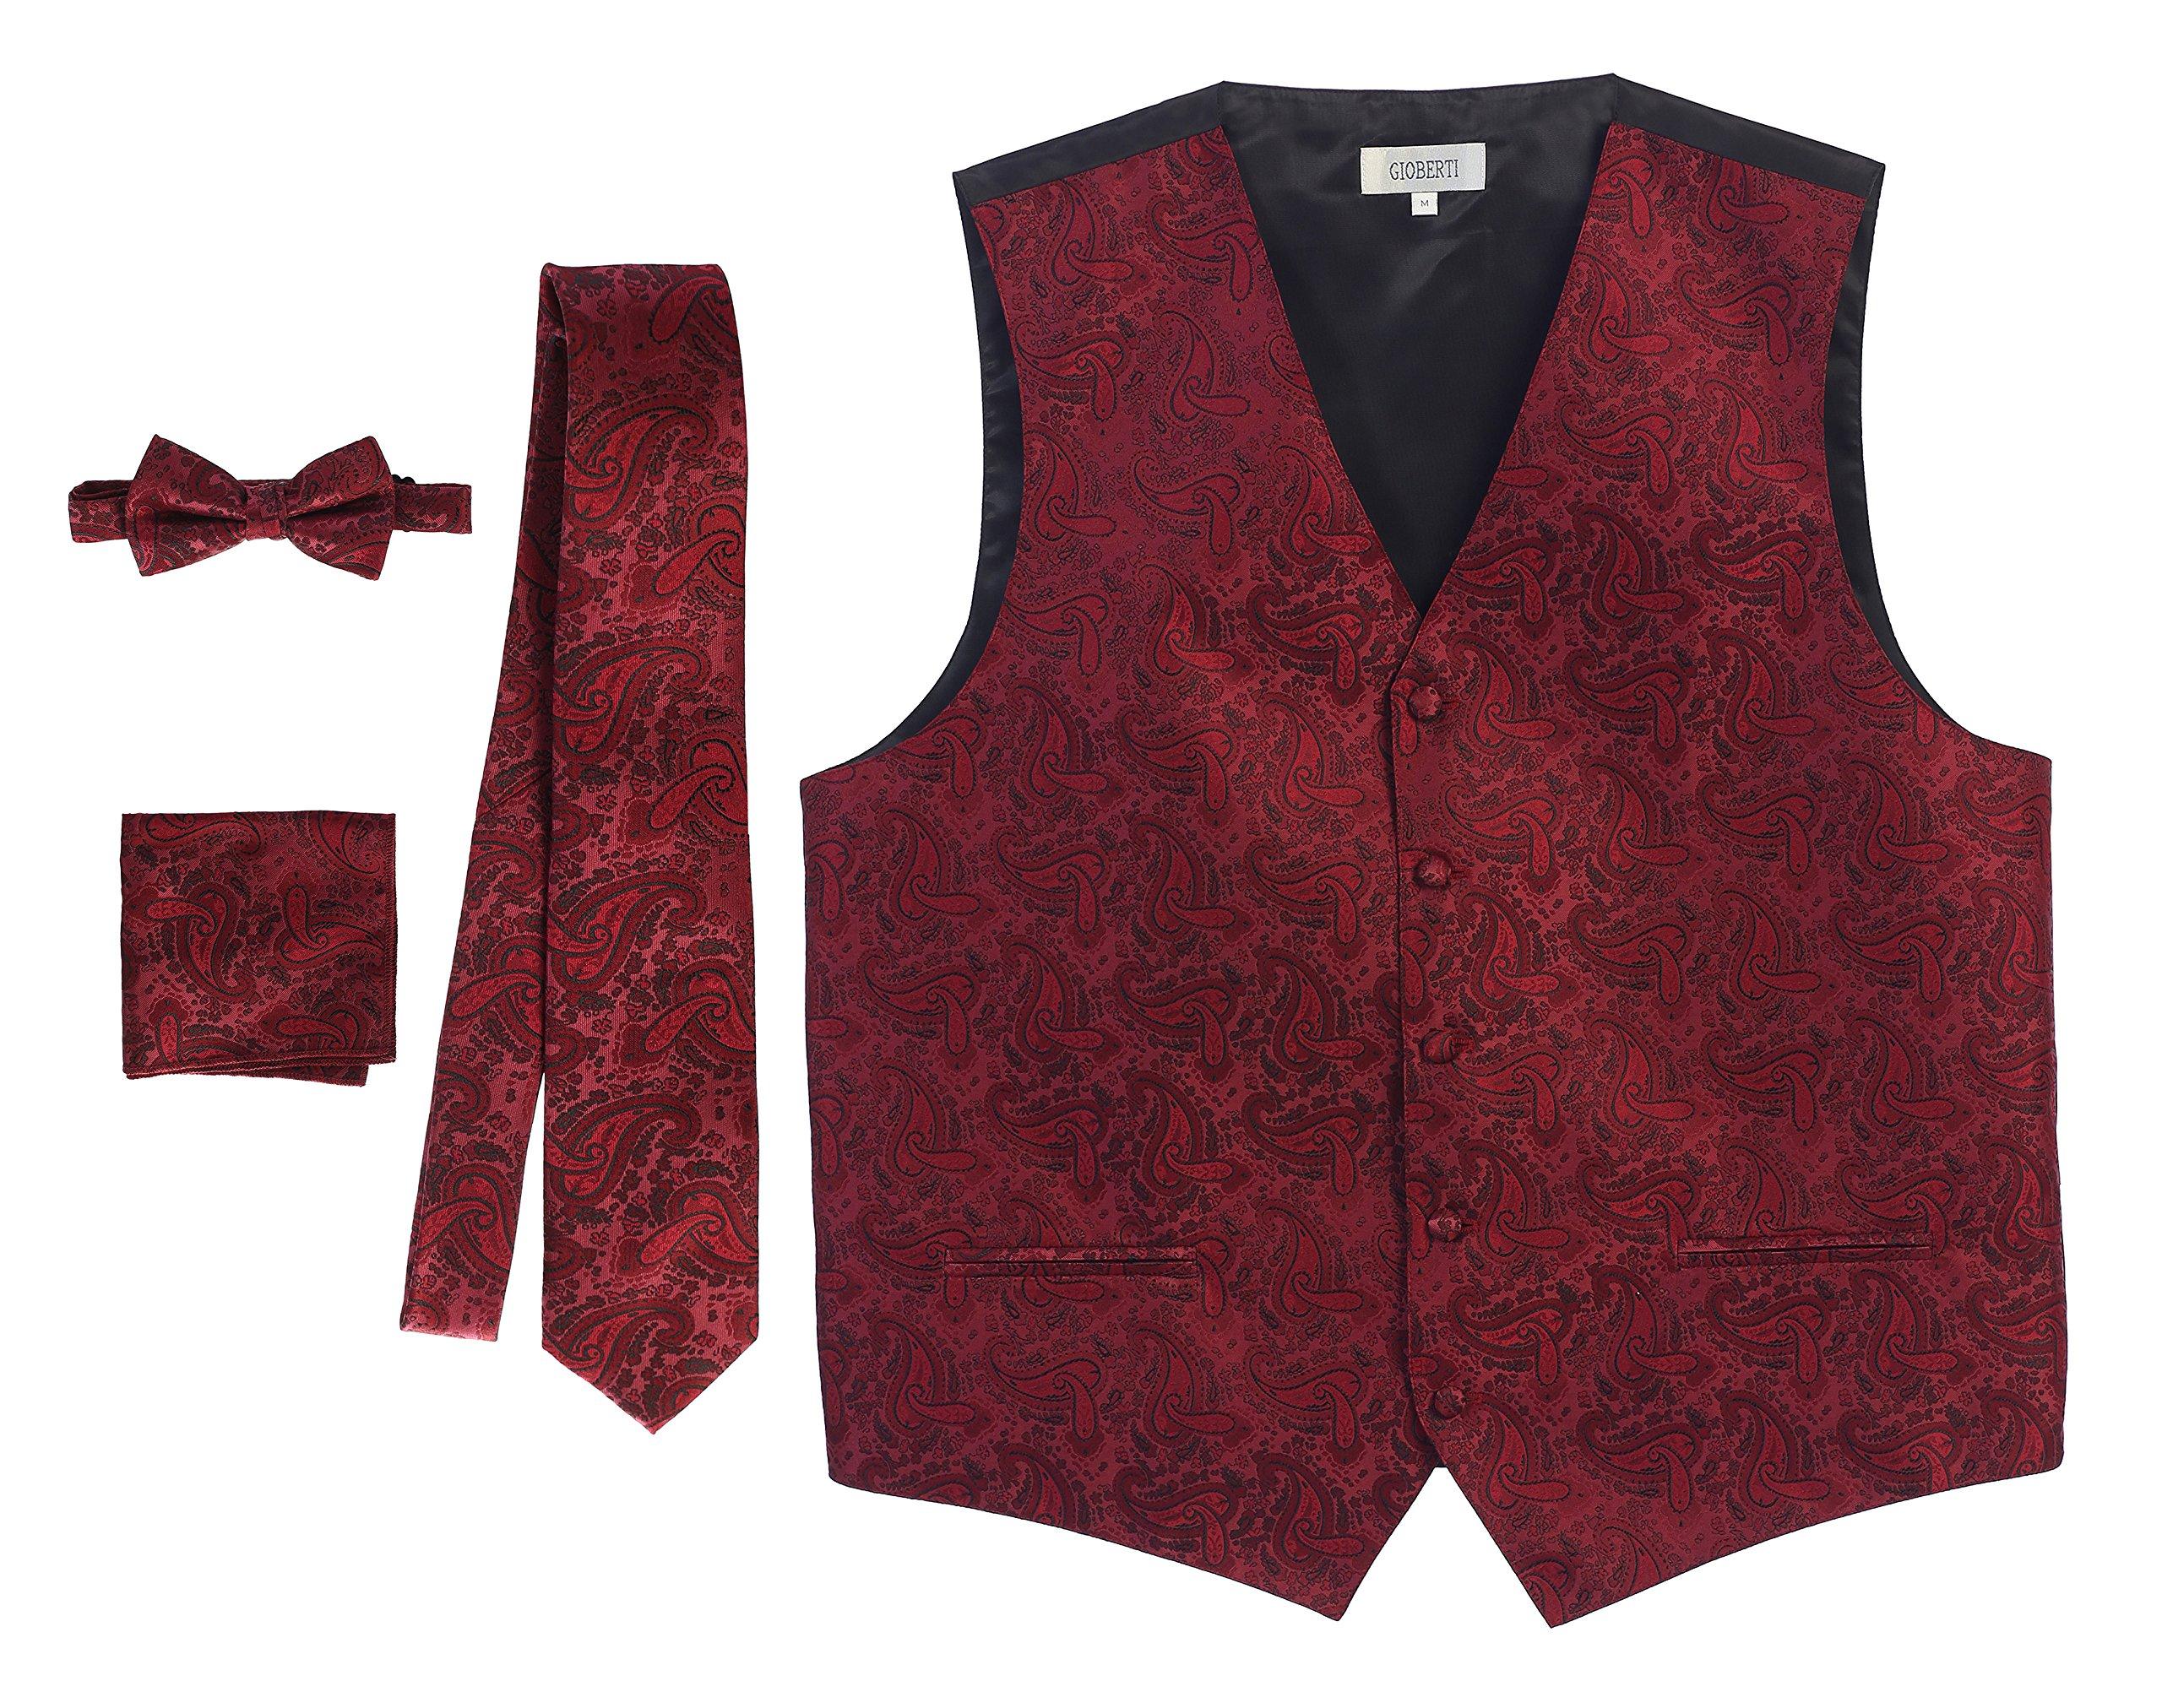 Gioberti Men's 4 Piece Formal Paisley Vest Set, Burgundy, Large